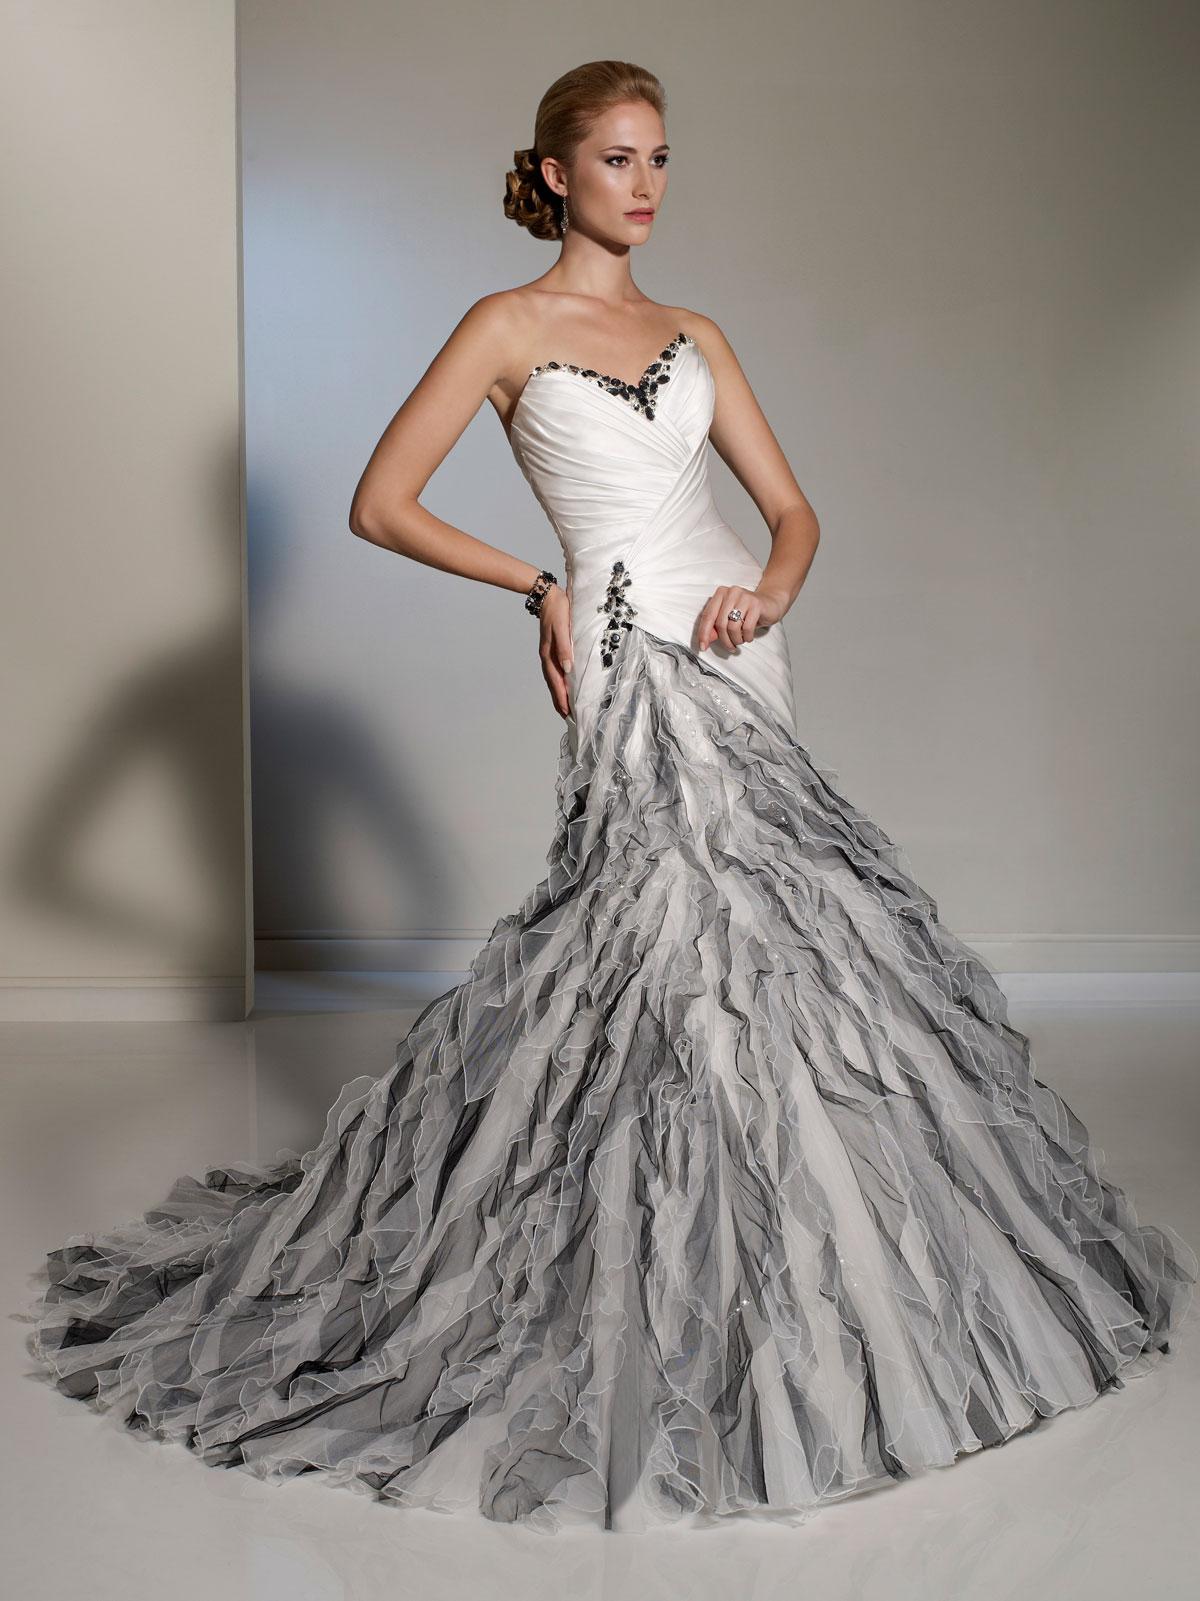 ruffled wedding dress gray dresses for wedding Grey and white wedding dresses